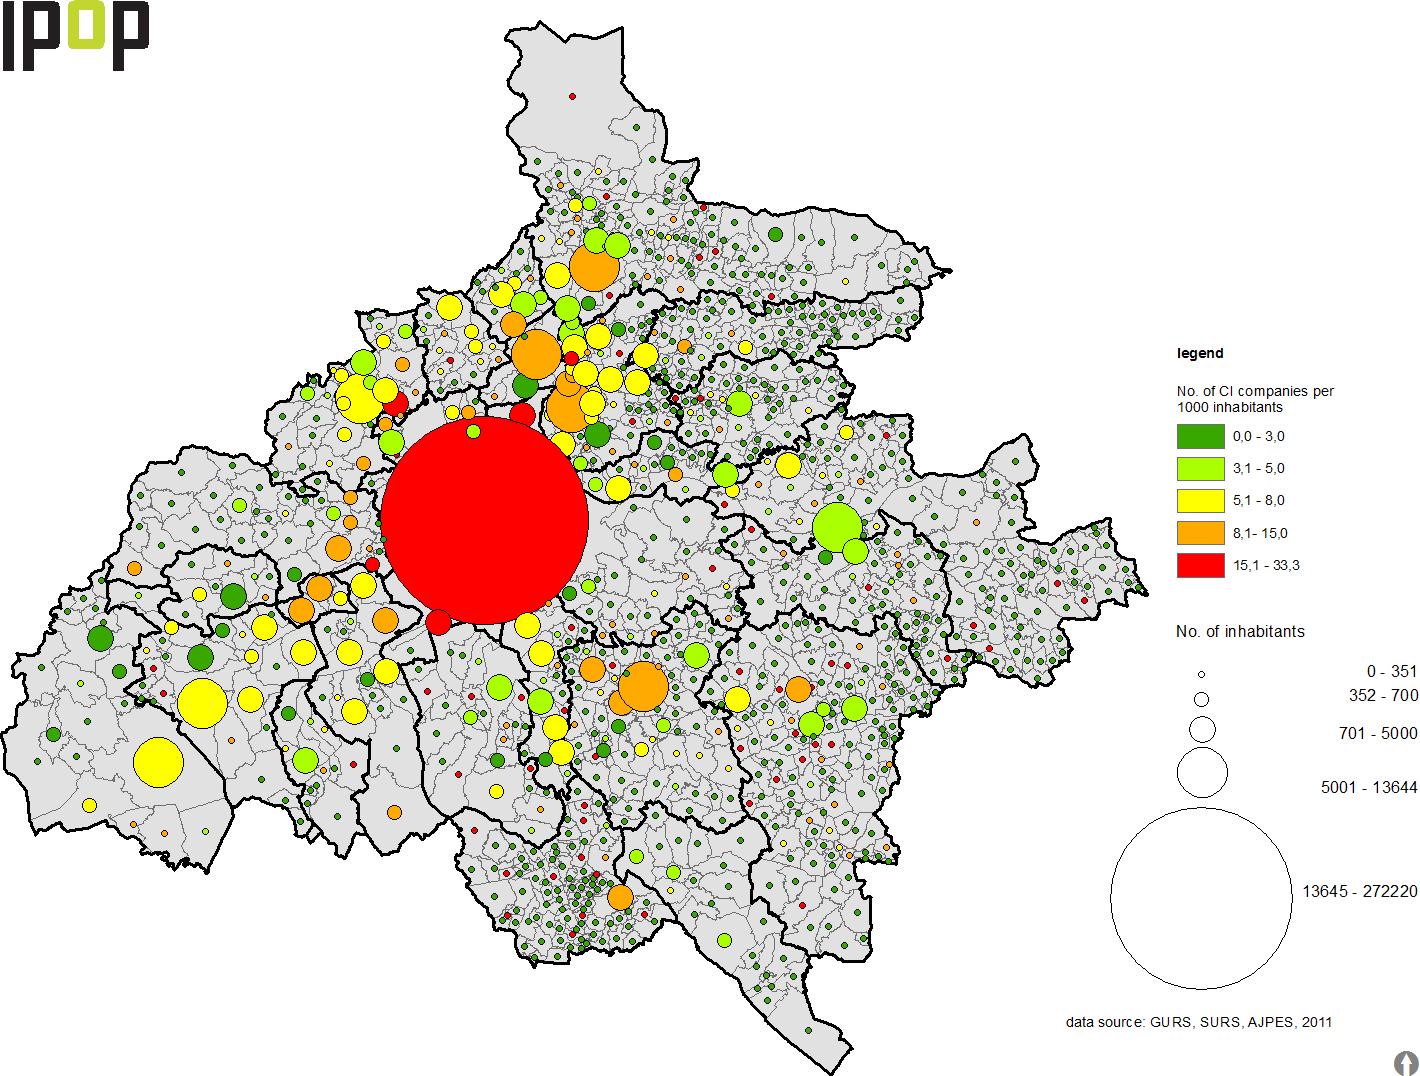 Potentials of Creative Urban Regeneration